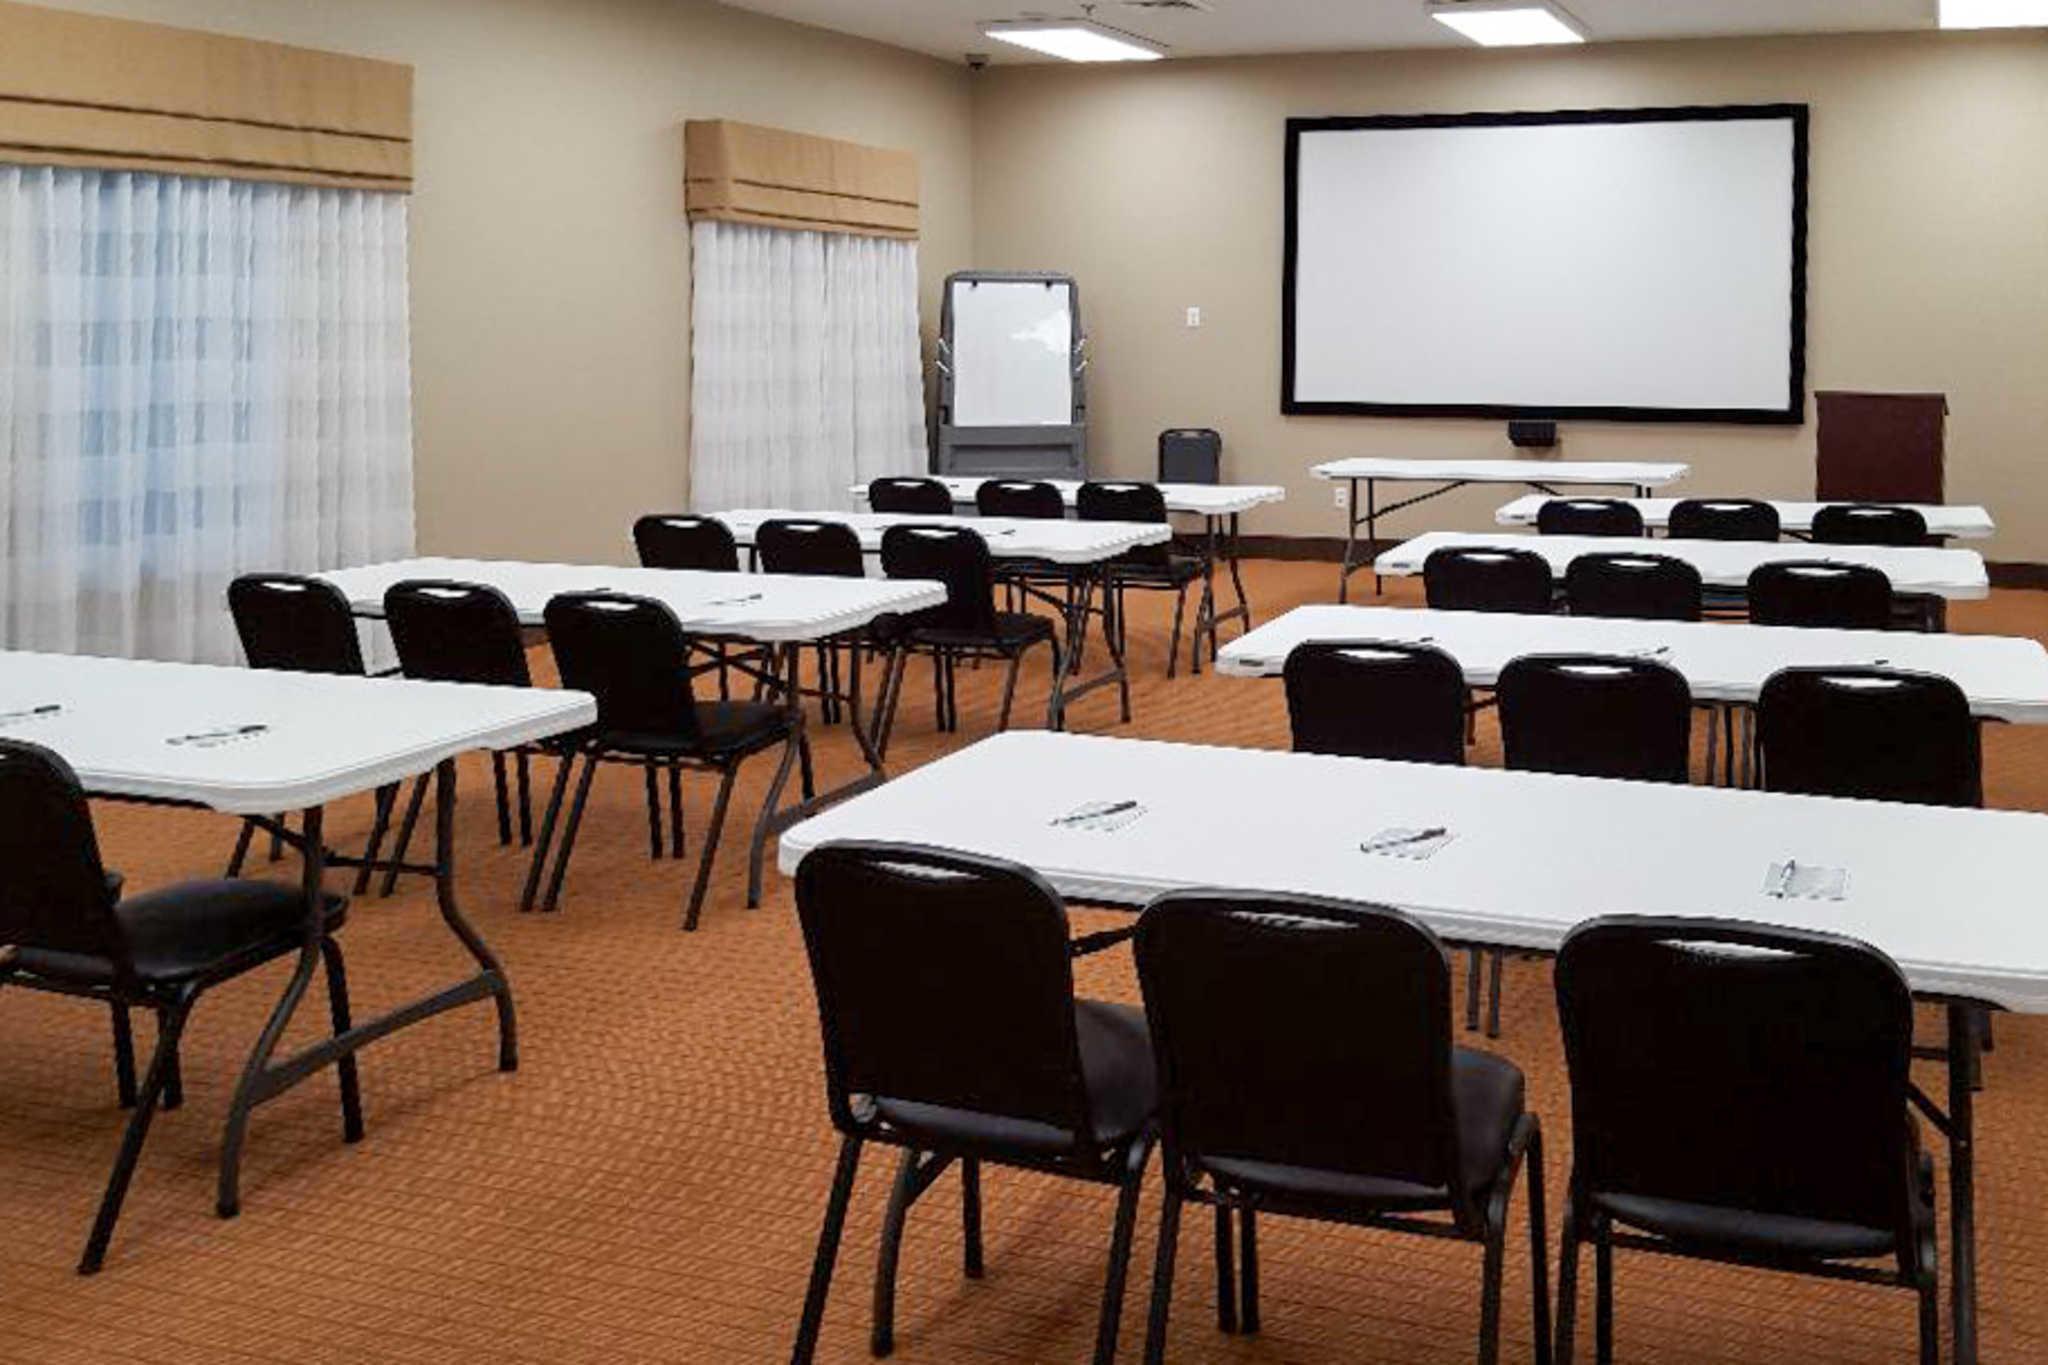 Sleep Inn & Suites Belmont / St. Clairsville image 14